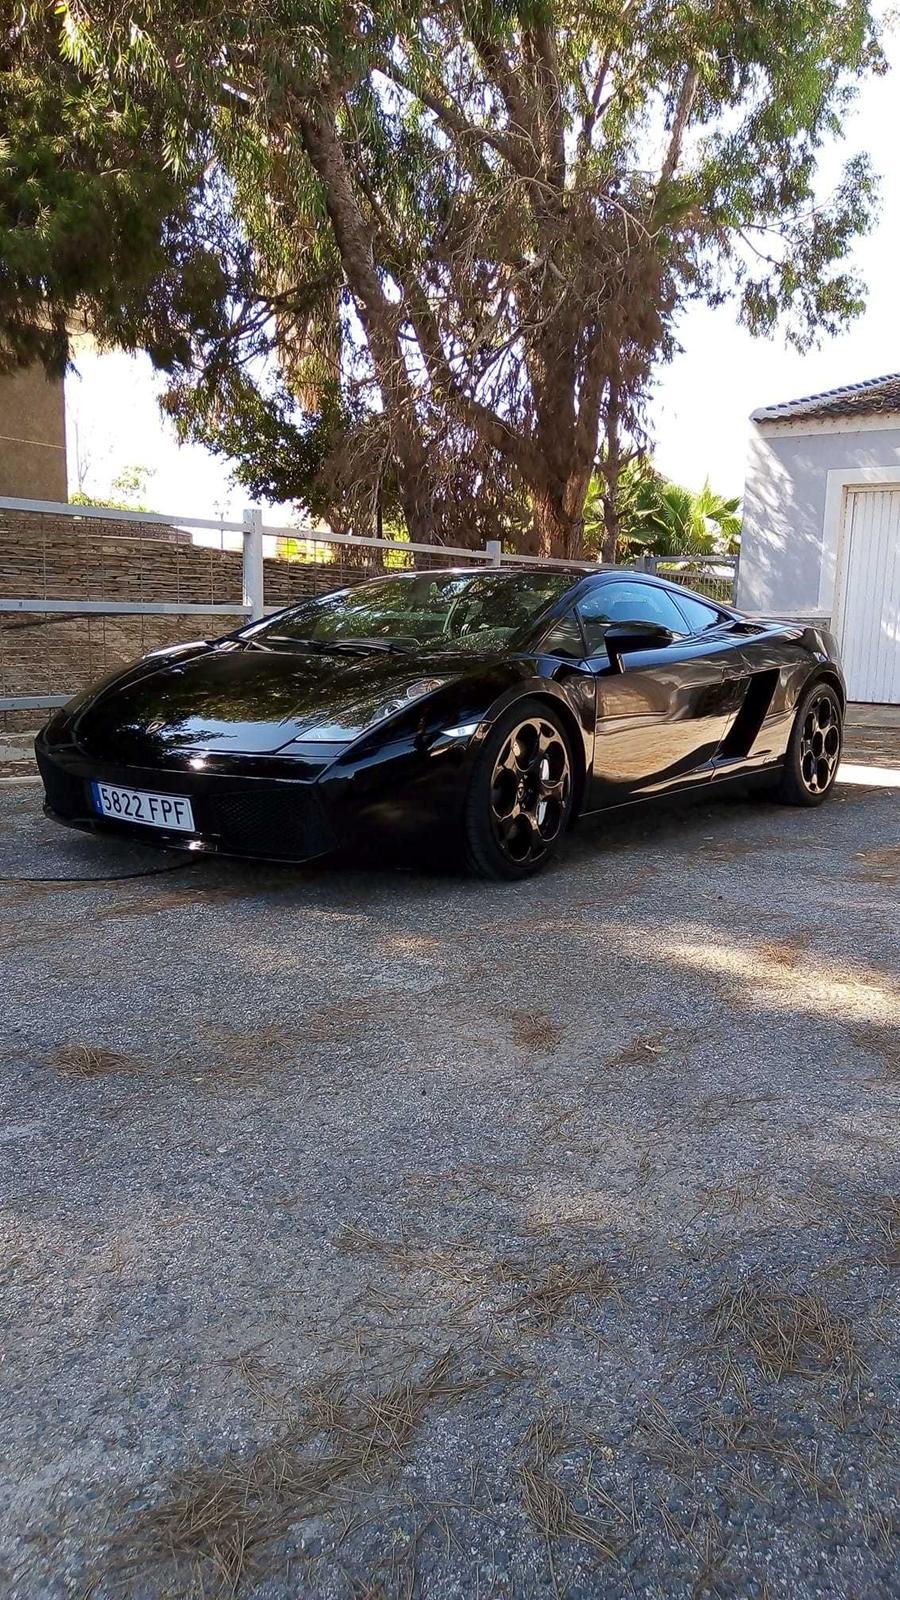 Lamborghini Gallardo billede 3